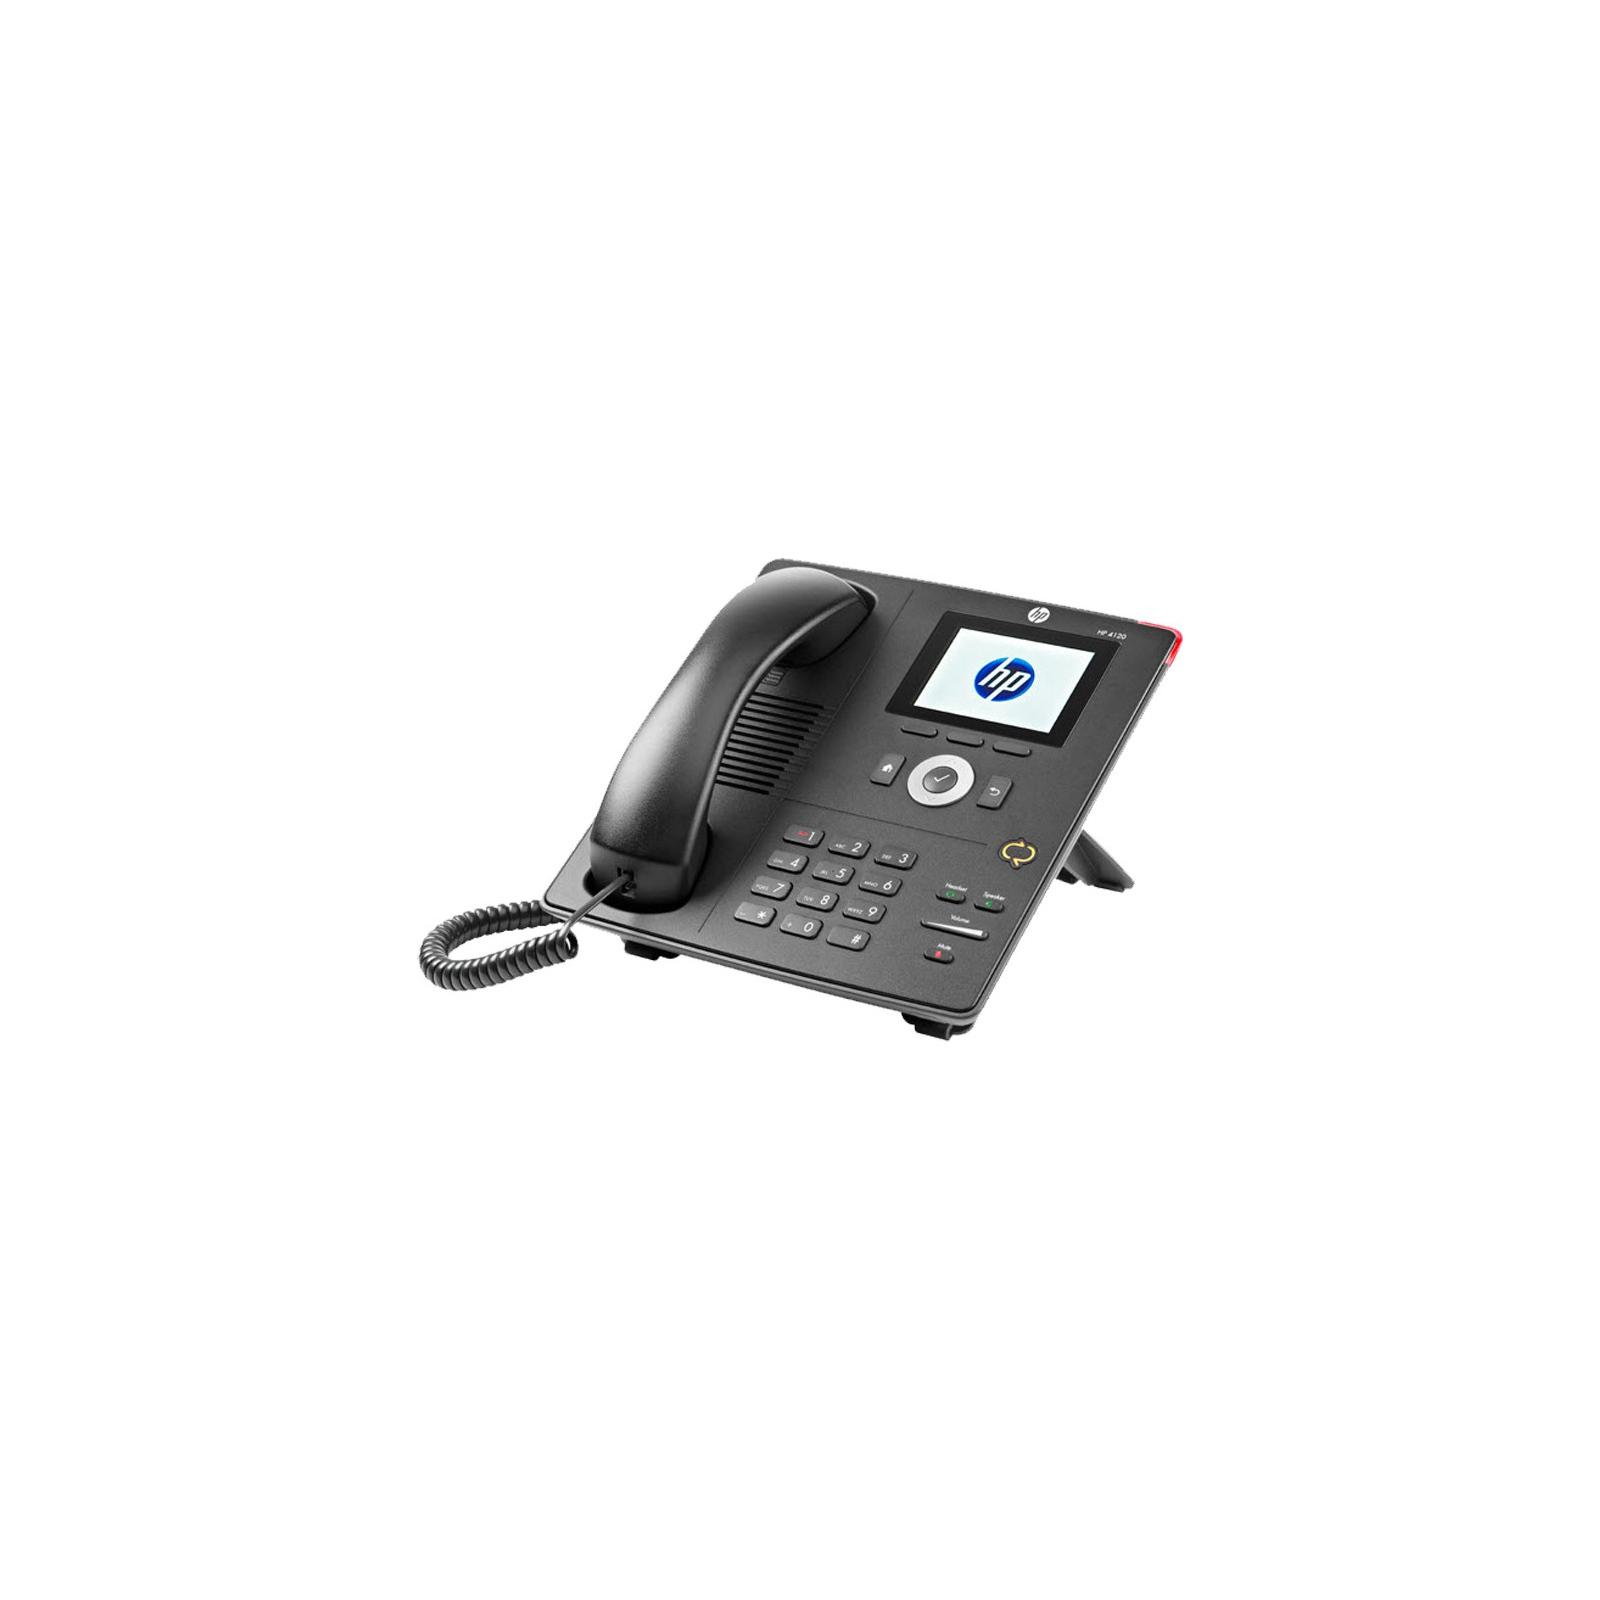 IP телефон HP 4120 (J9766C) изображение 2